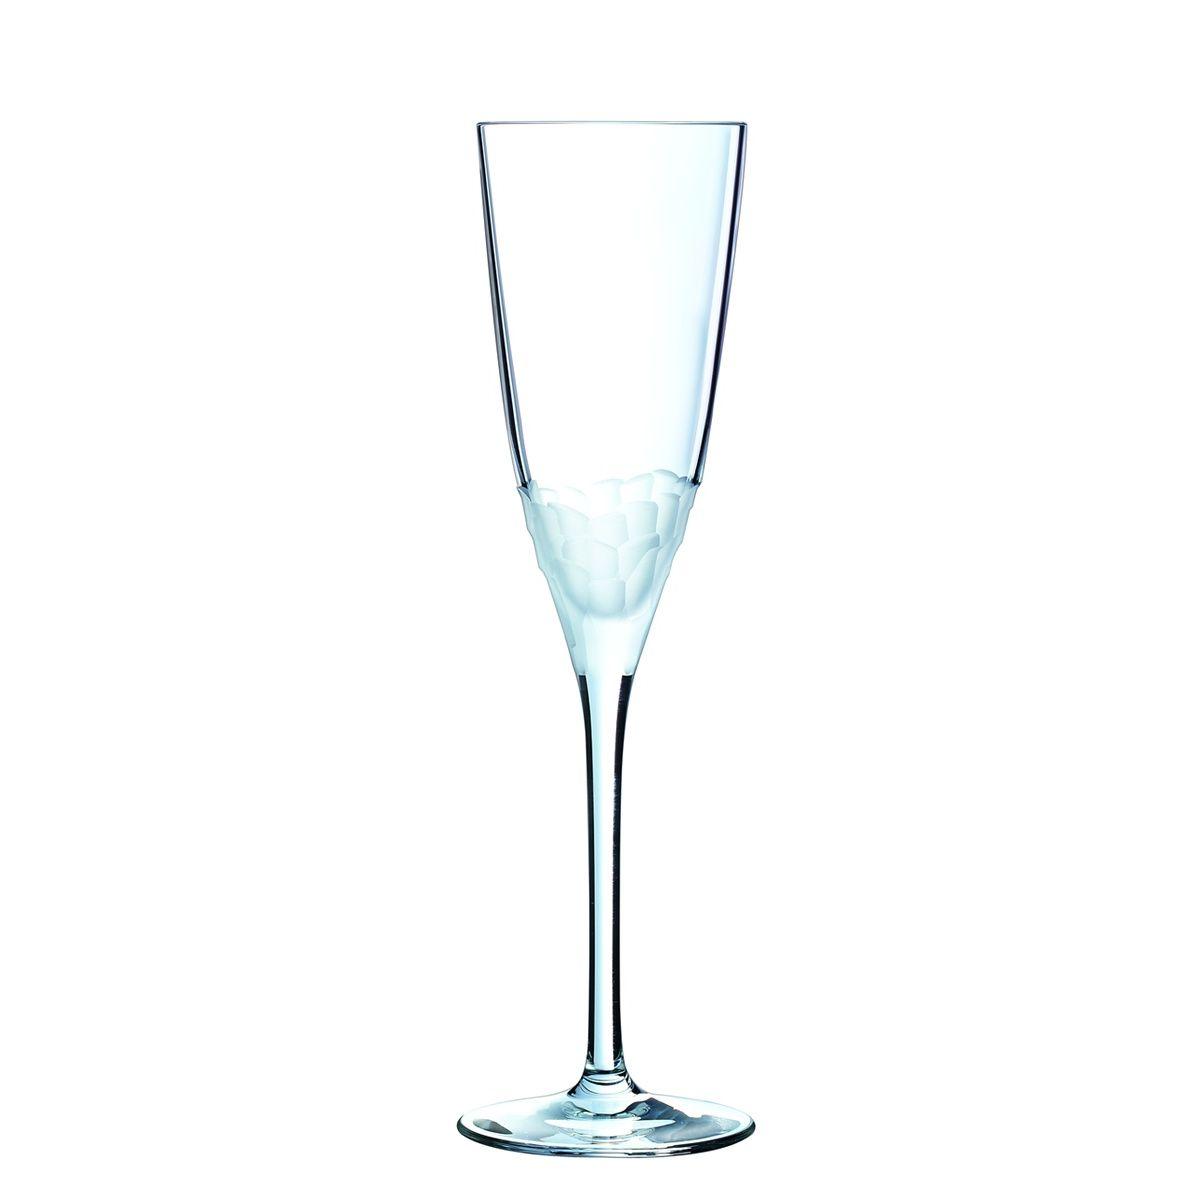 Набор бокалов д/шампанского 6 шт 170 мл INTUITIONНабор из 6-ти бокалов для шампанского 170 мл INTUITION<br>